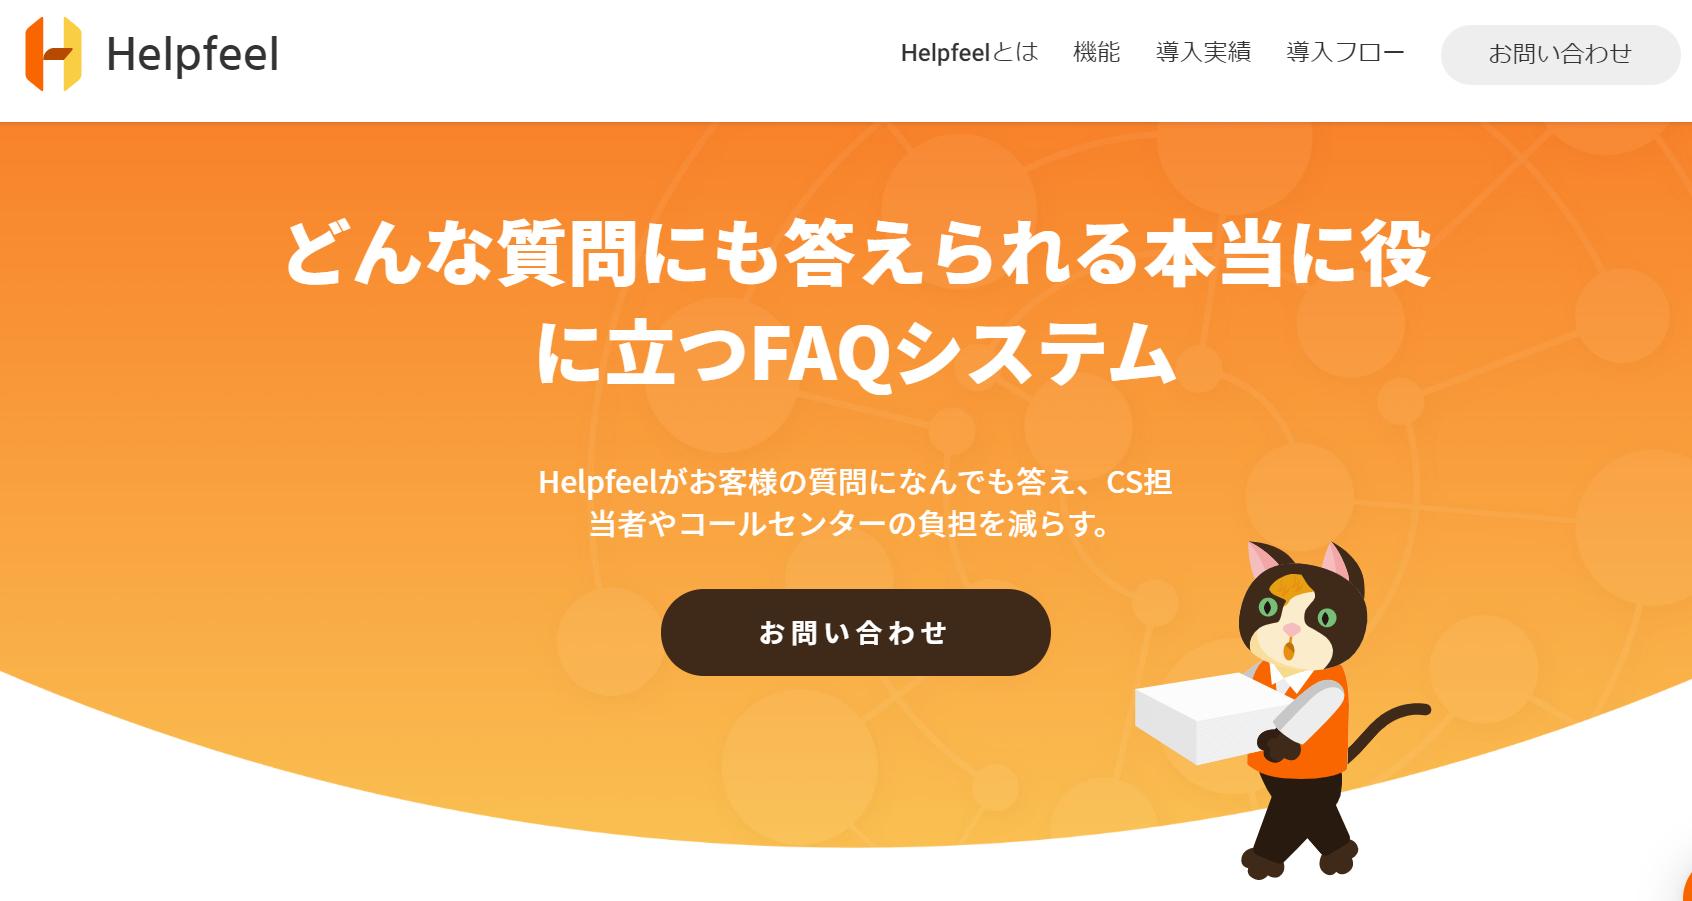 Helpfeel公式サイト